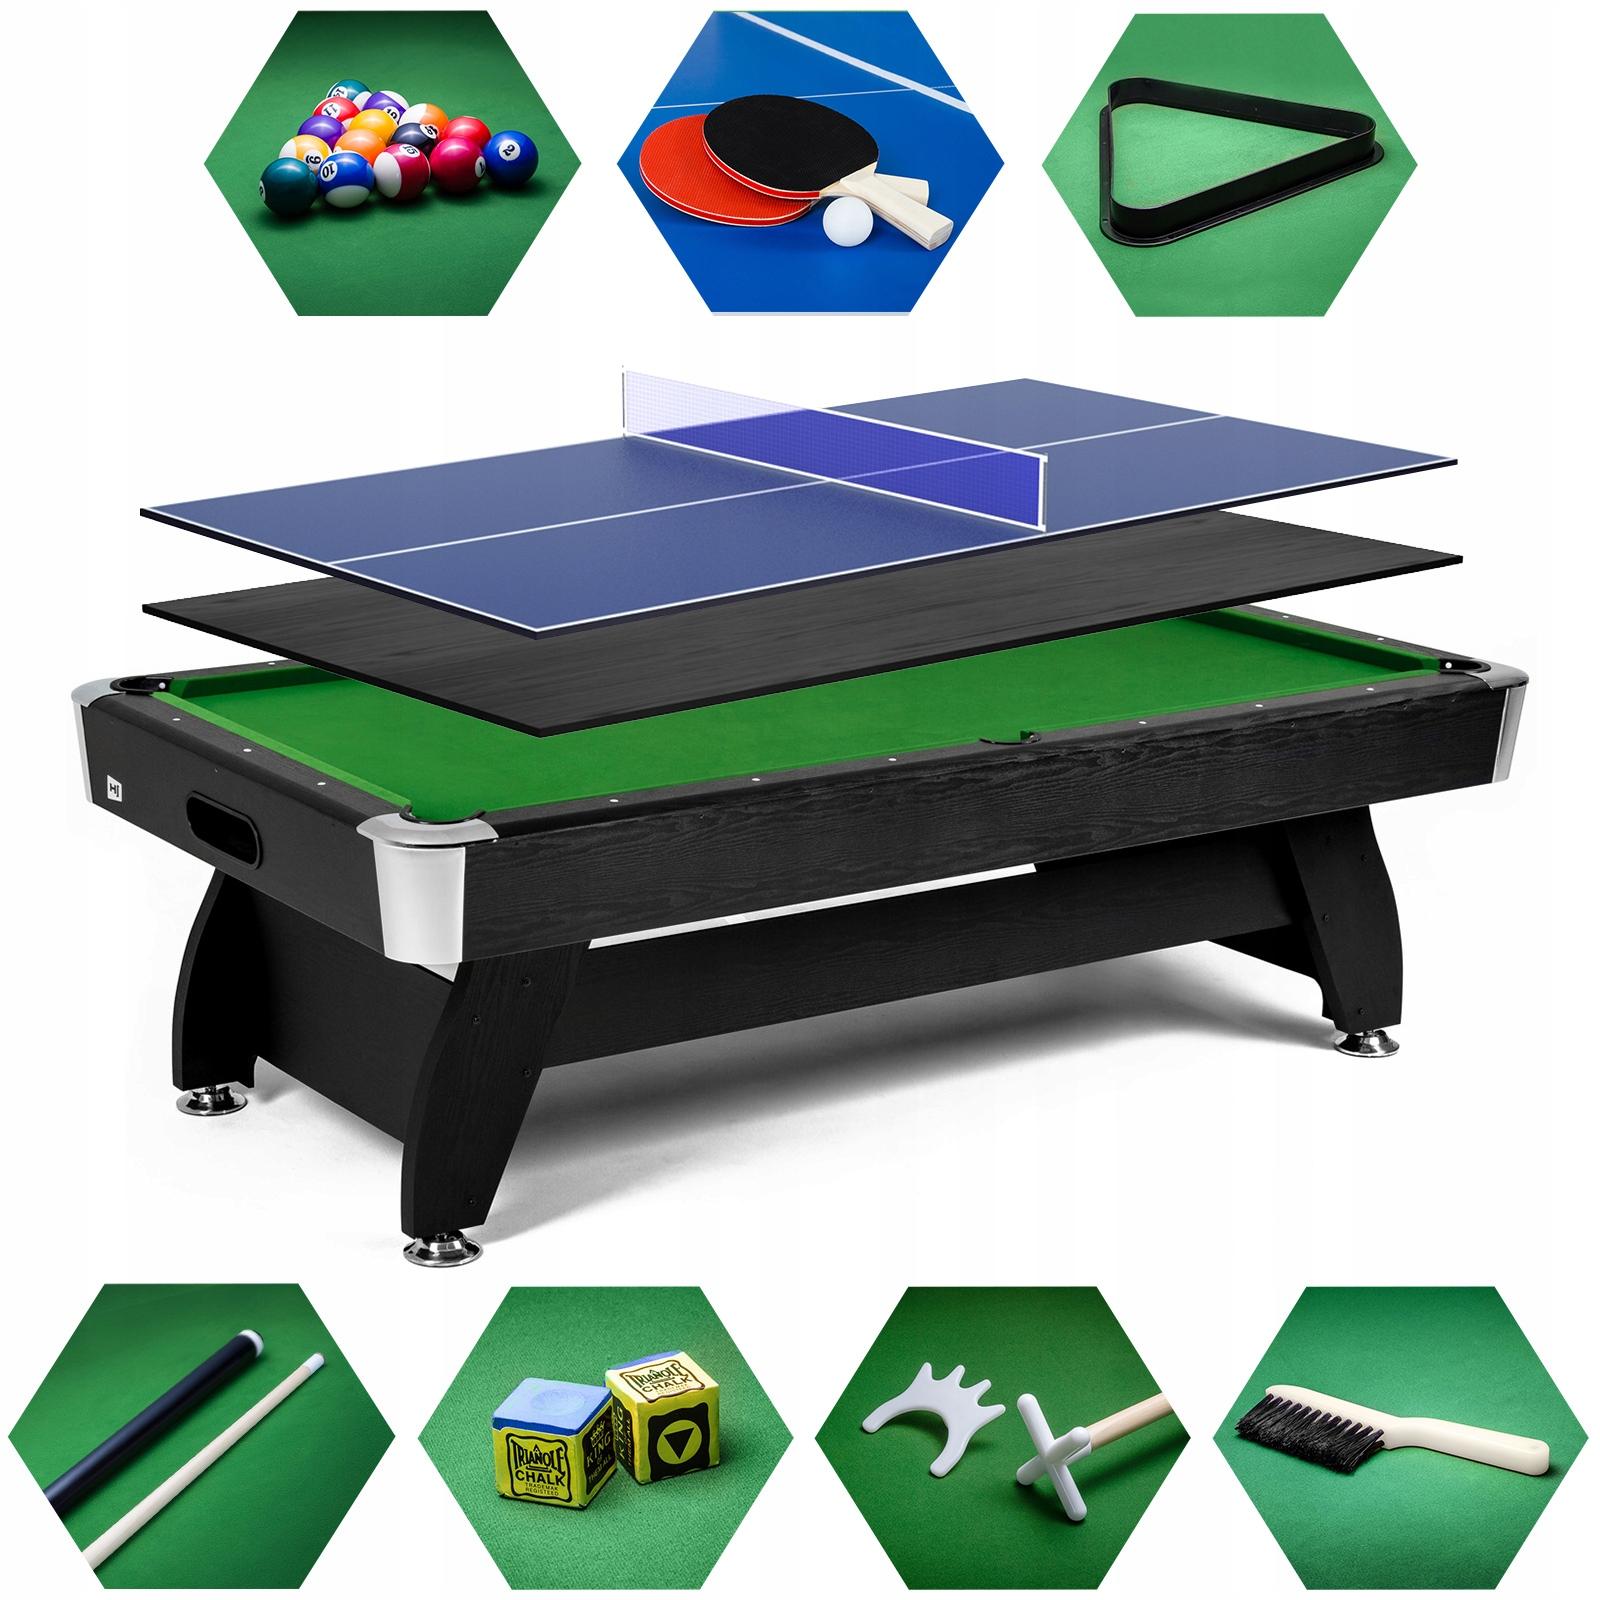 Stół bilardowy 7 ft с накладка ping pong akcesoria